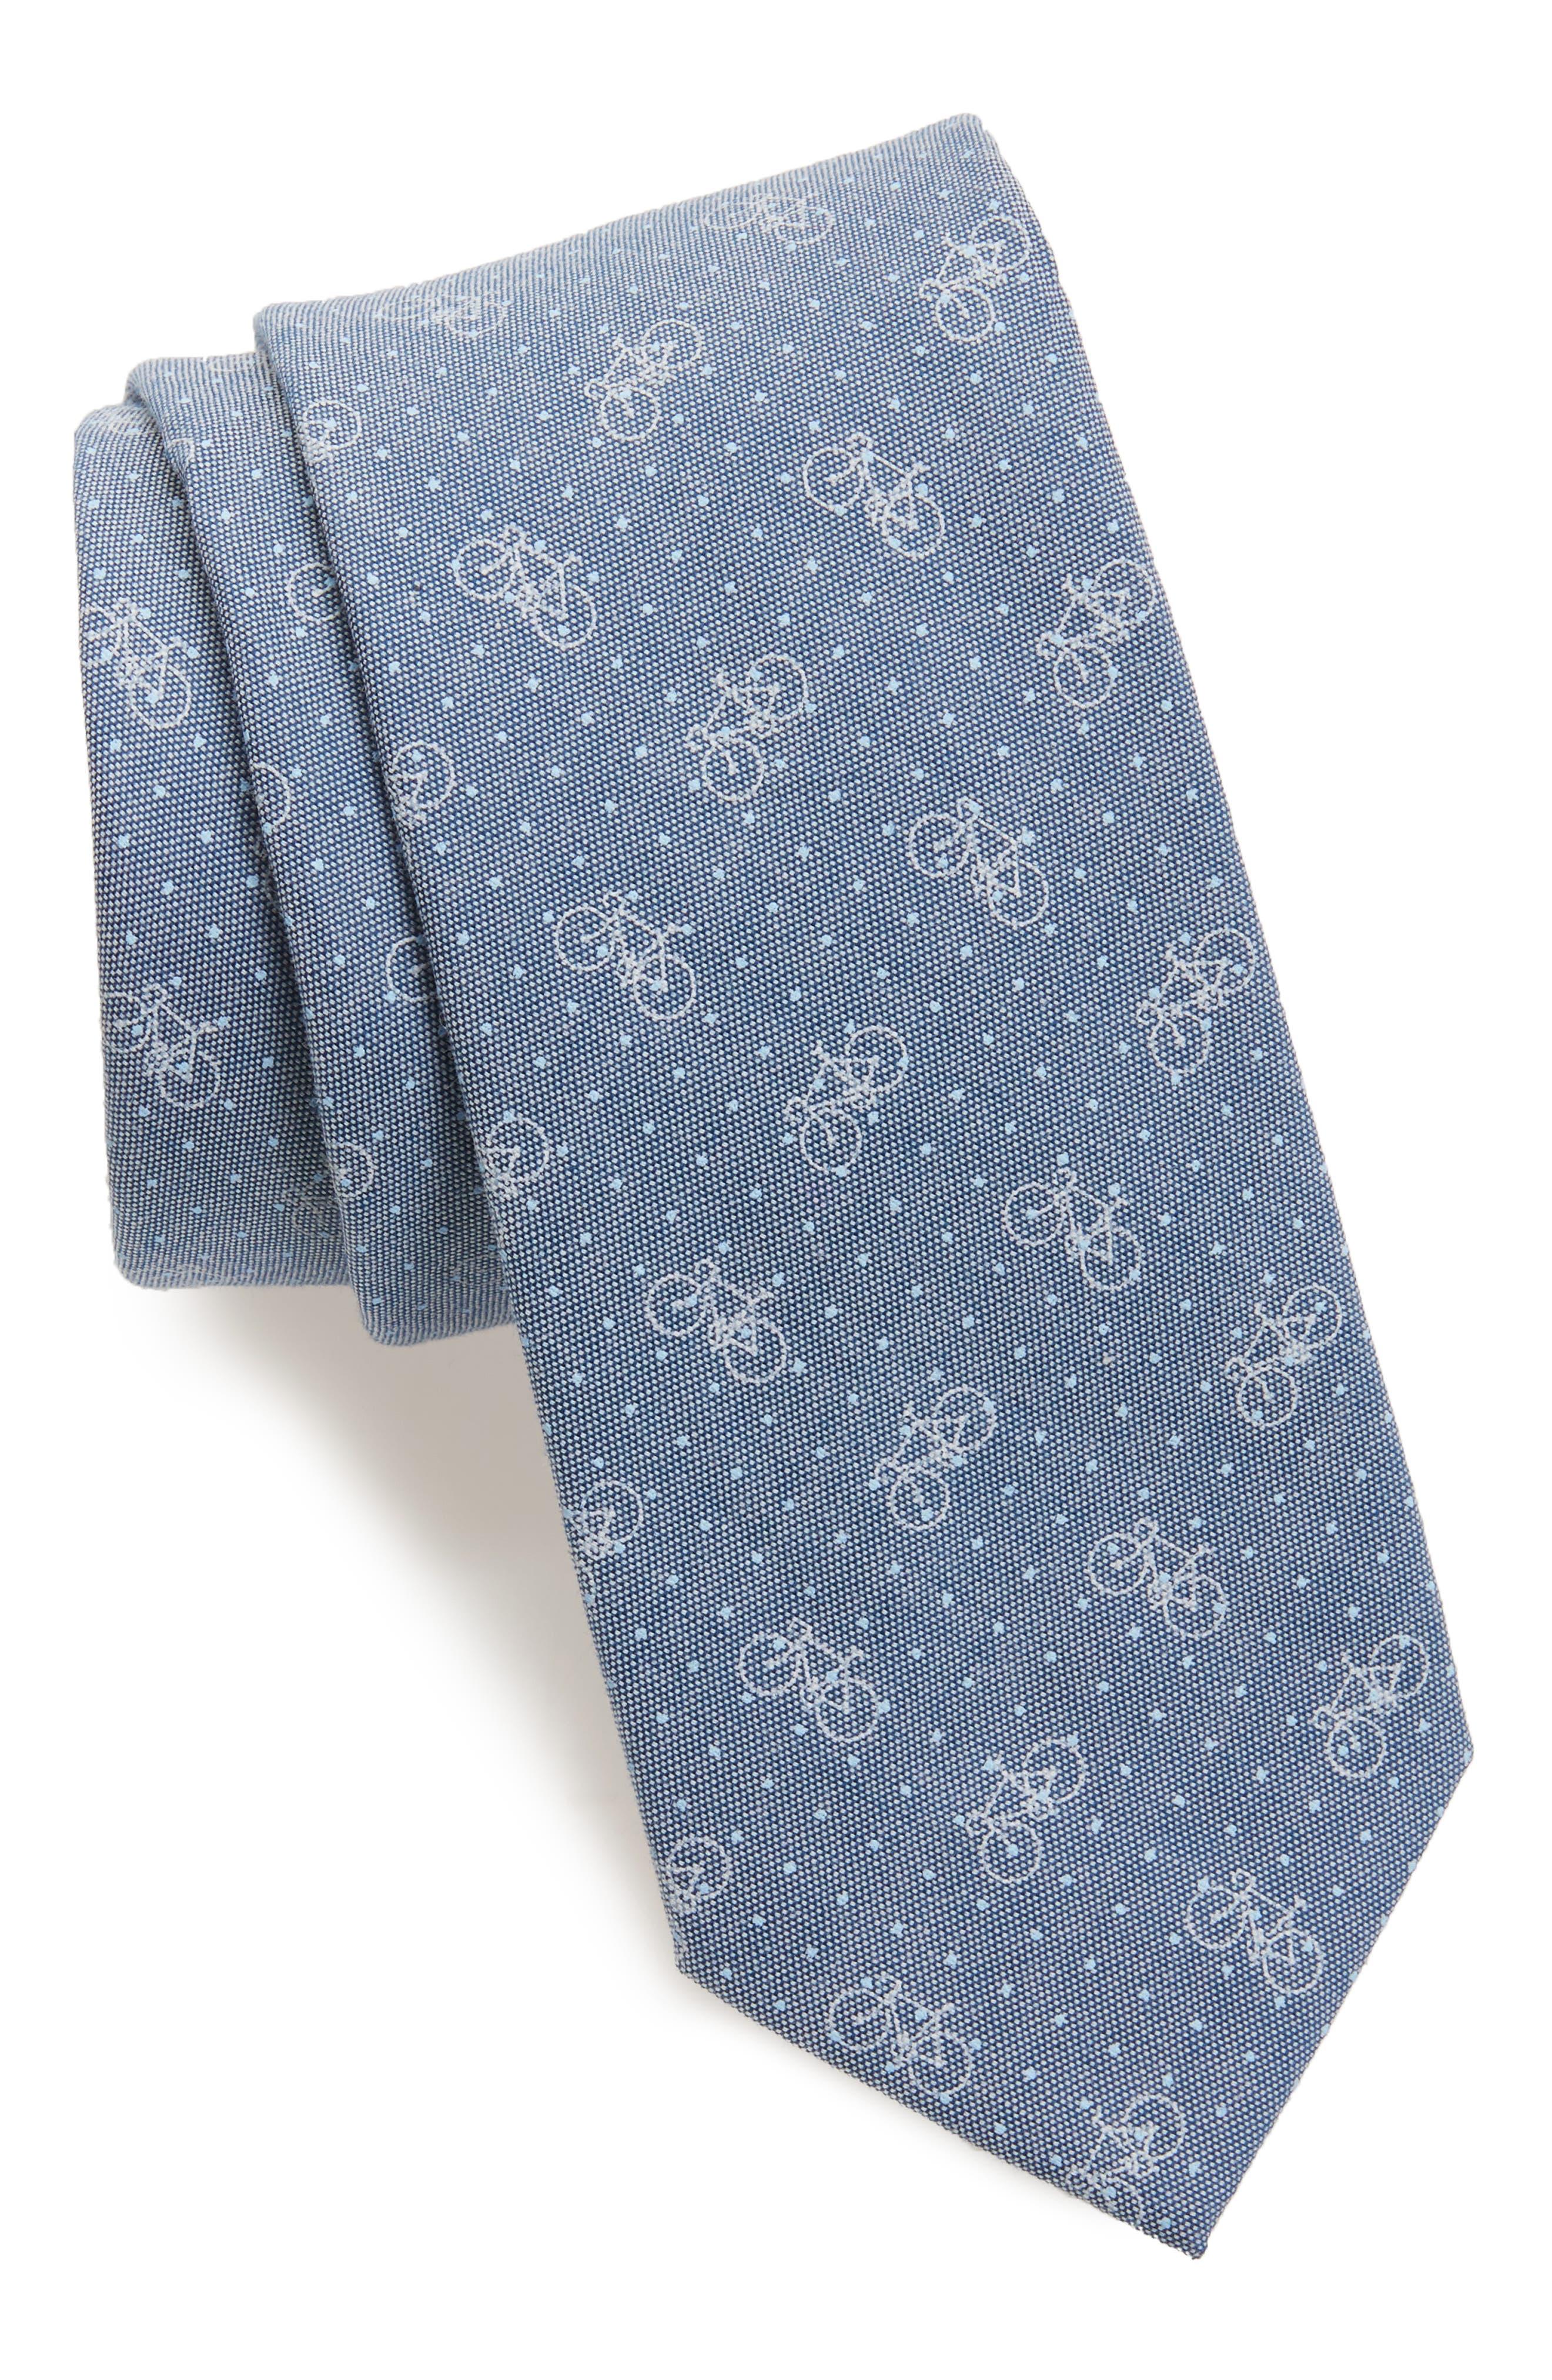 Main Image - Nordstrom Men's Shop Bicycle & Dot Cotton Tie